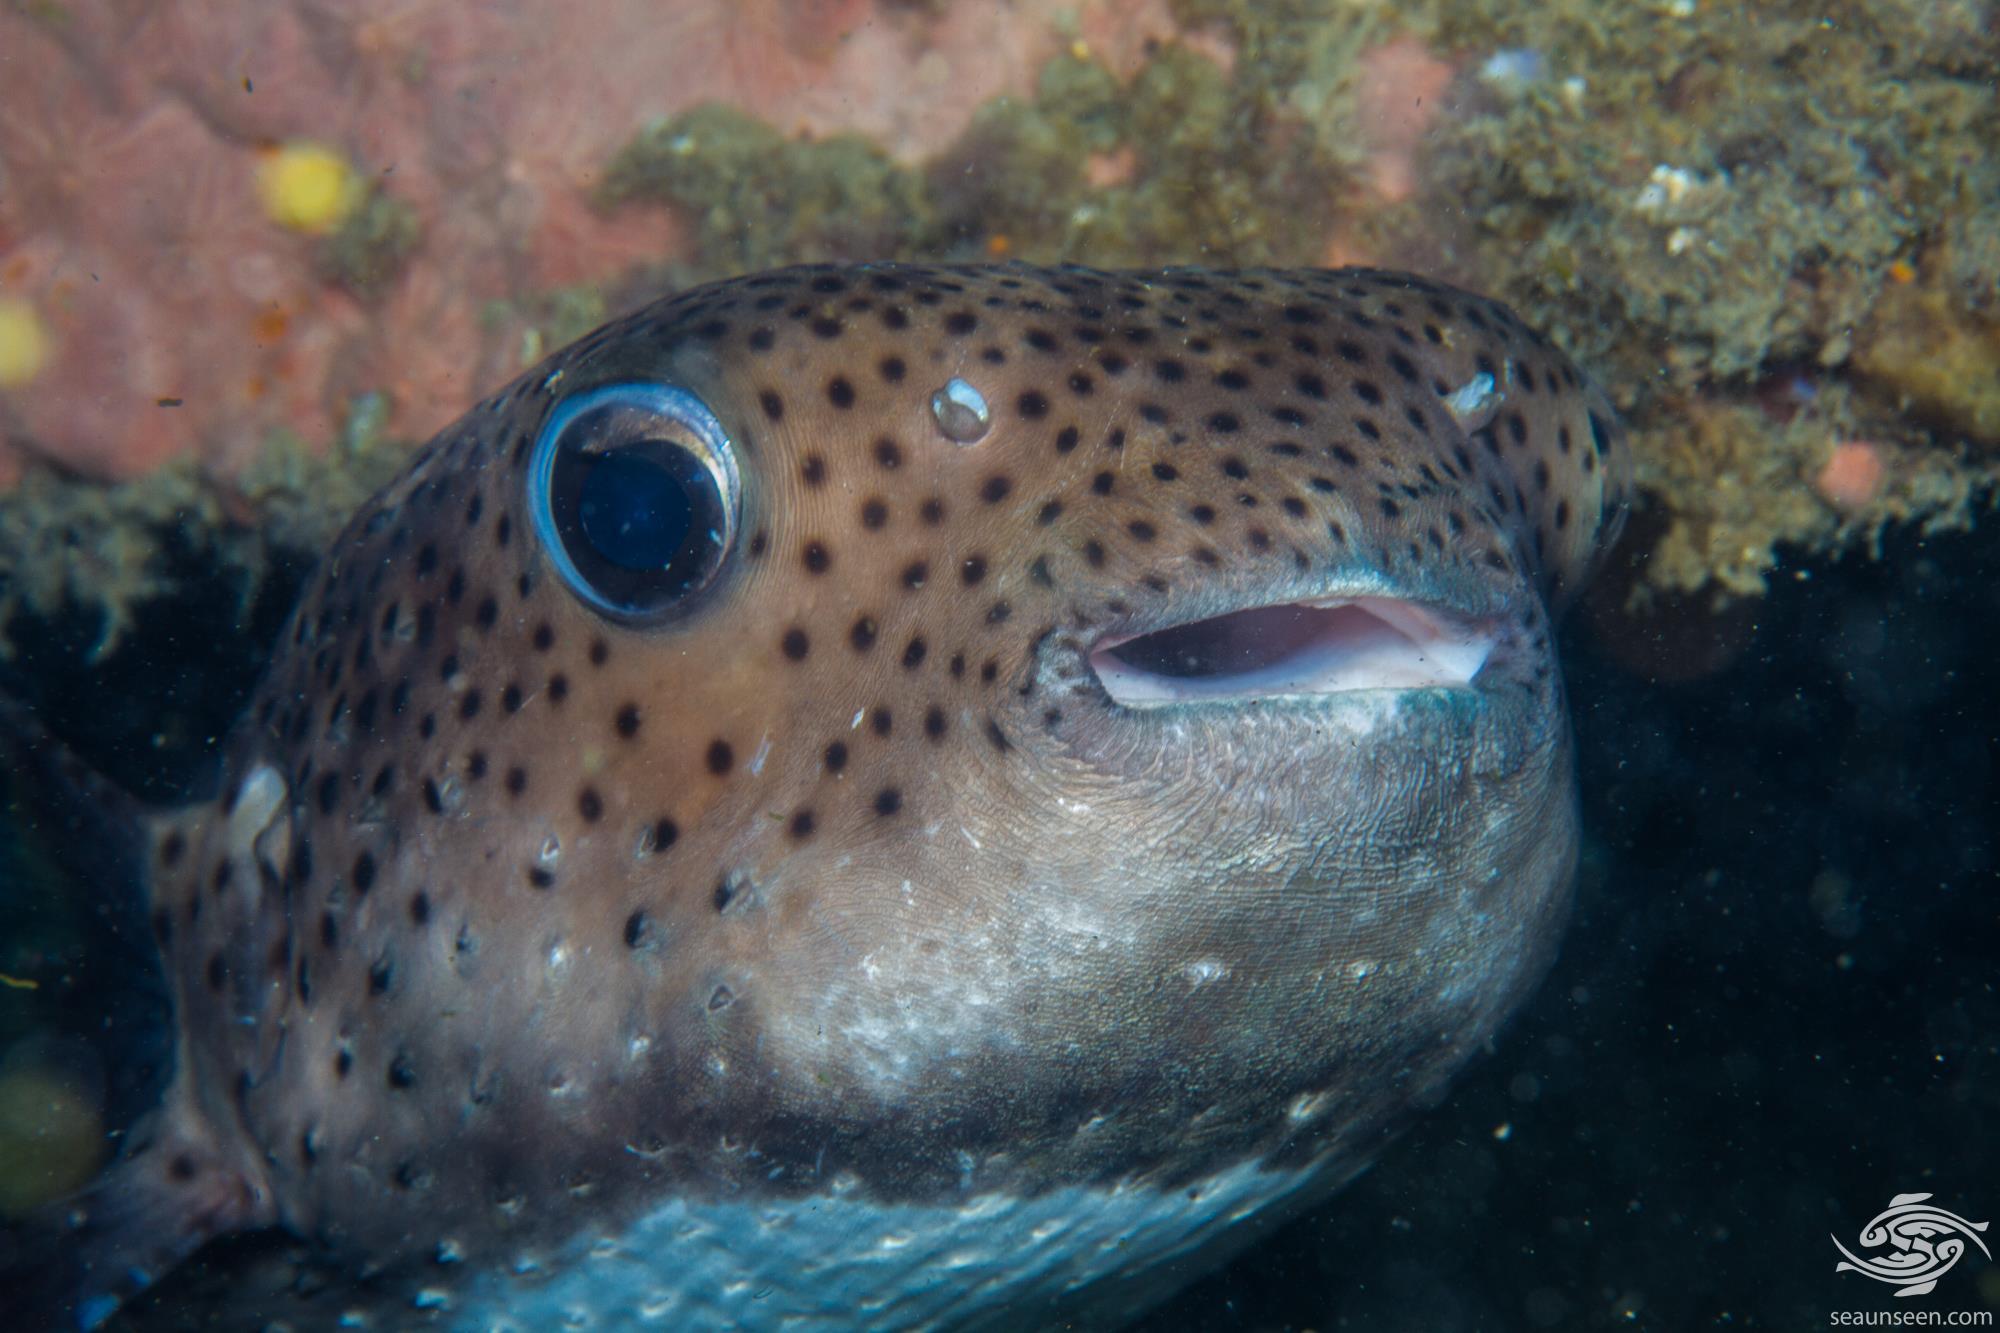 Spot-fin porcupinefish (Diodon hystrix) is also known as Spotted porcupinefish, Black-spotted porcupinefish or simply as the Porcupinefish